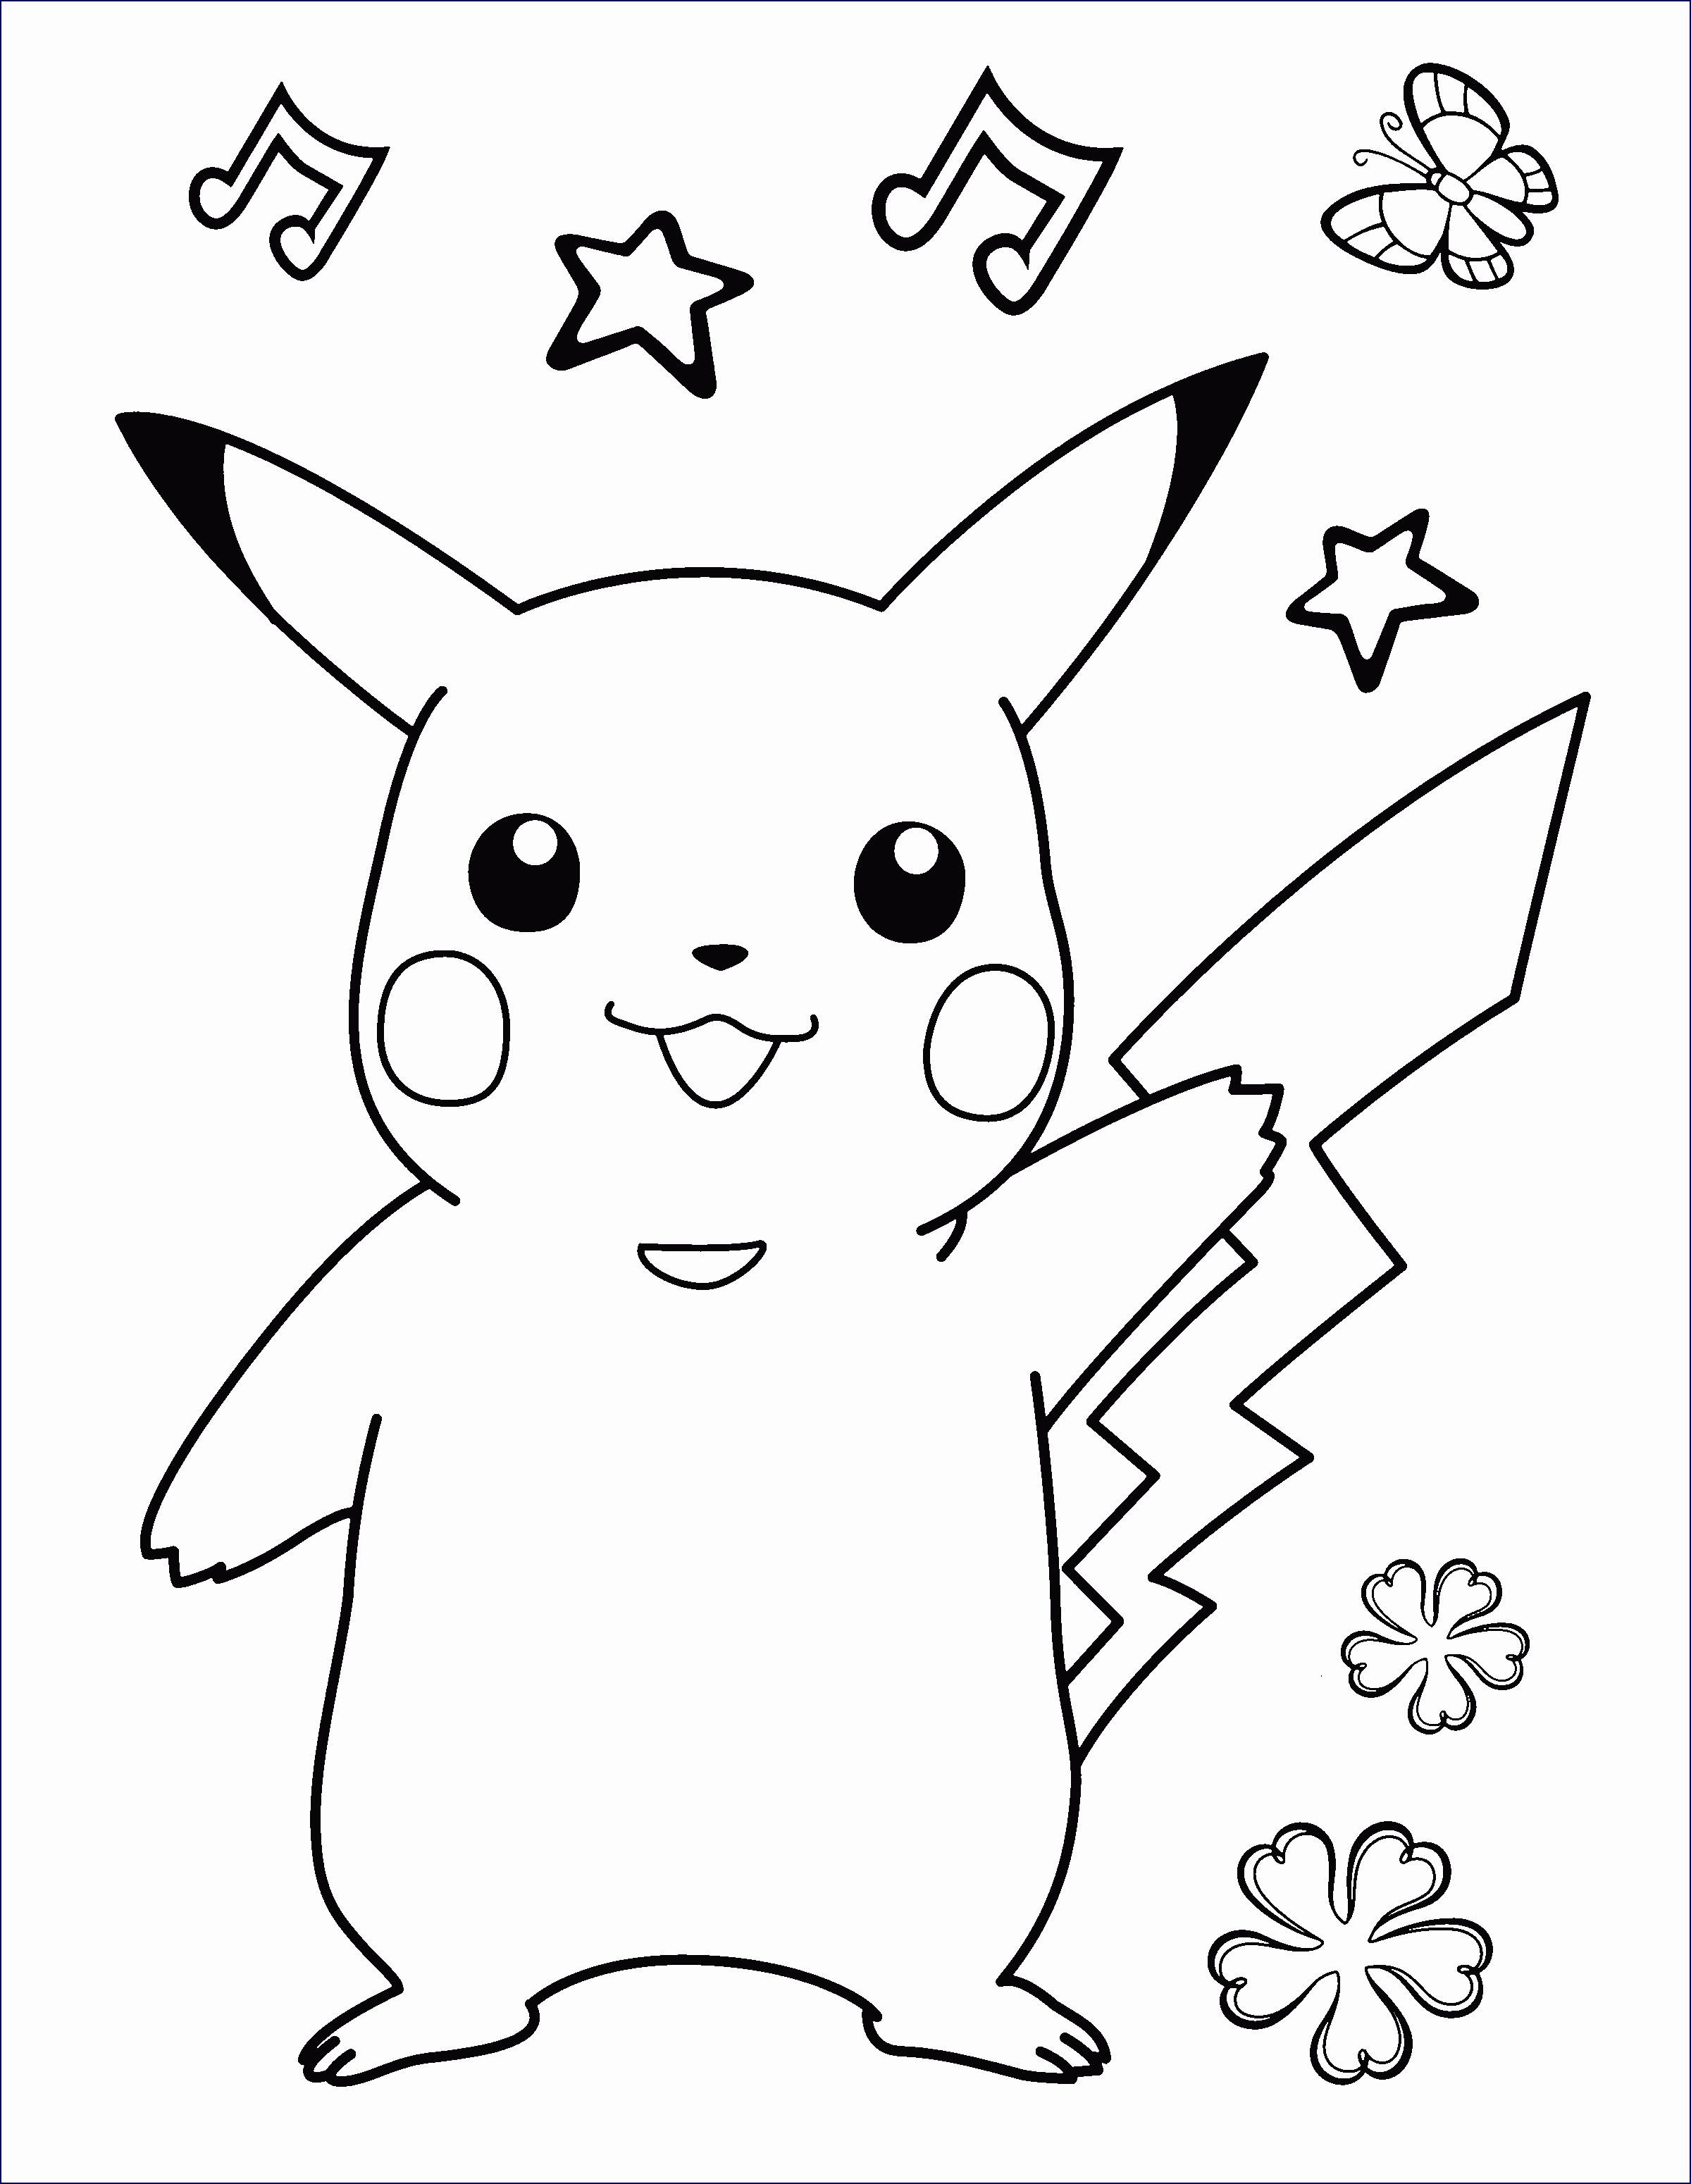 Beste 20 Ausmalbilder Pokemon Pikachu Beste Wohnkultur